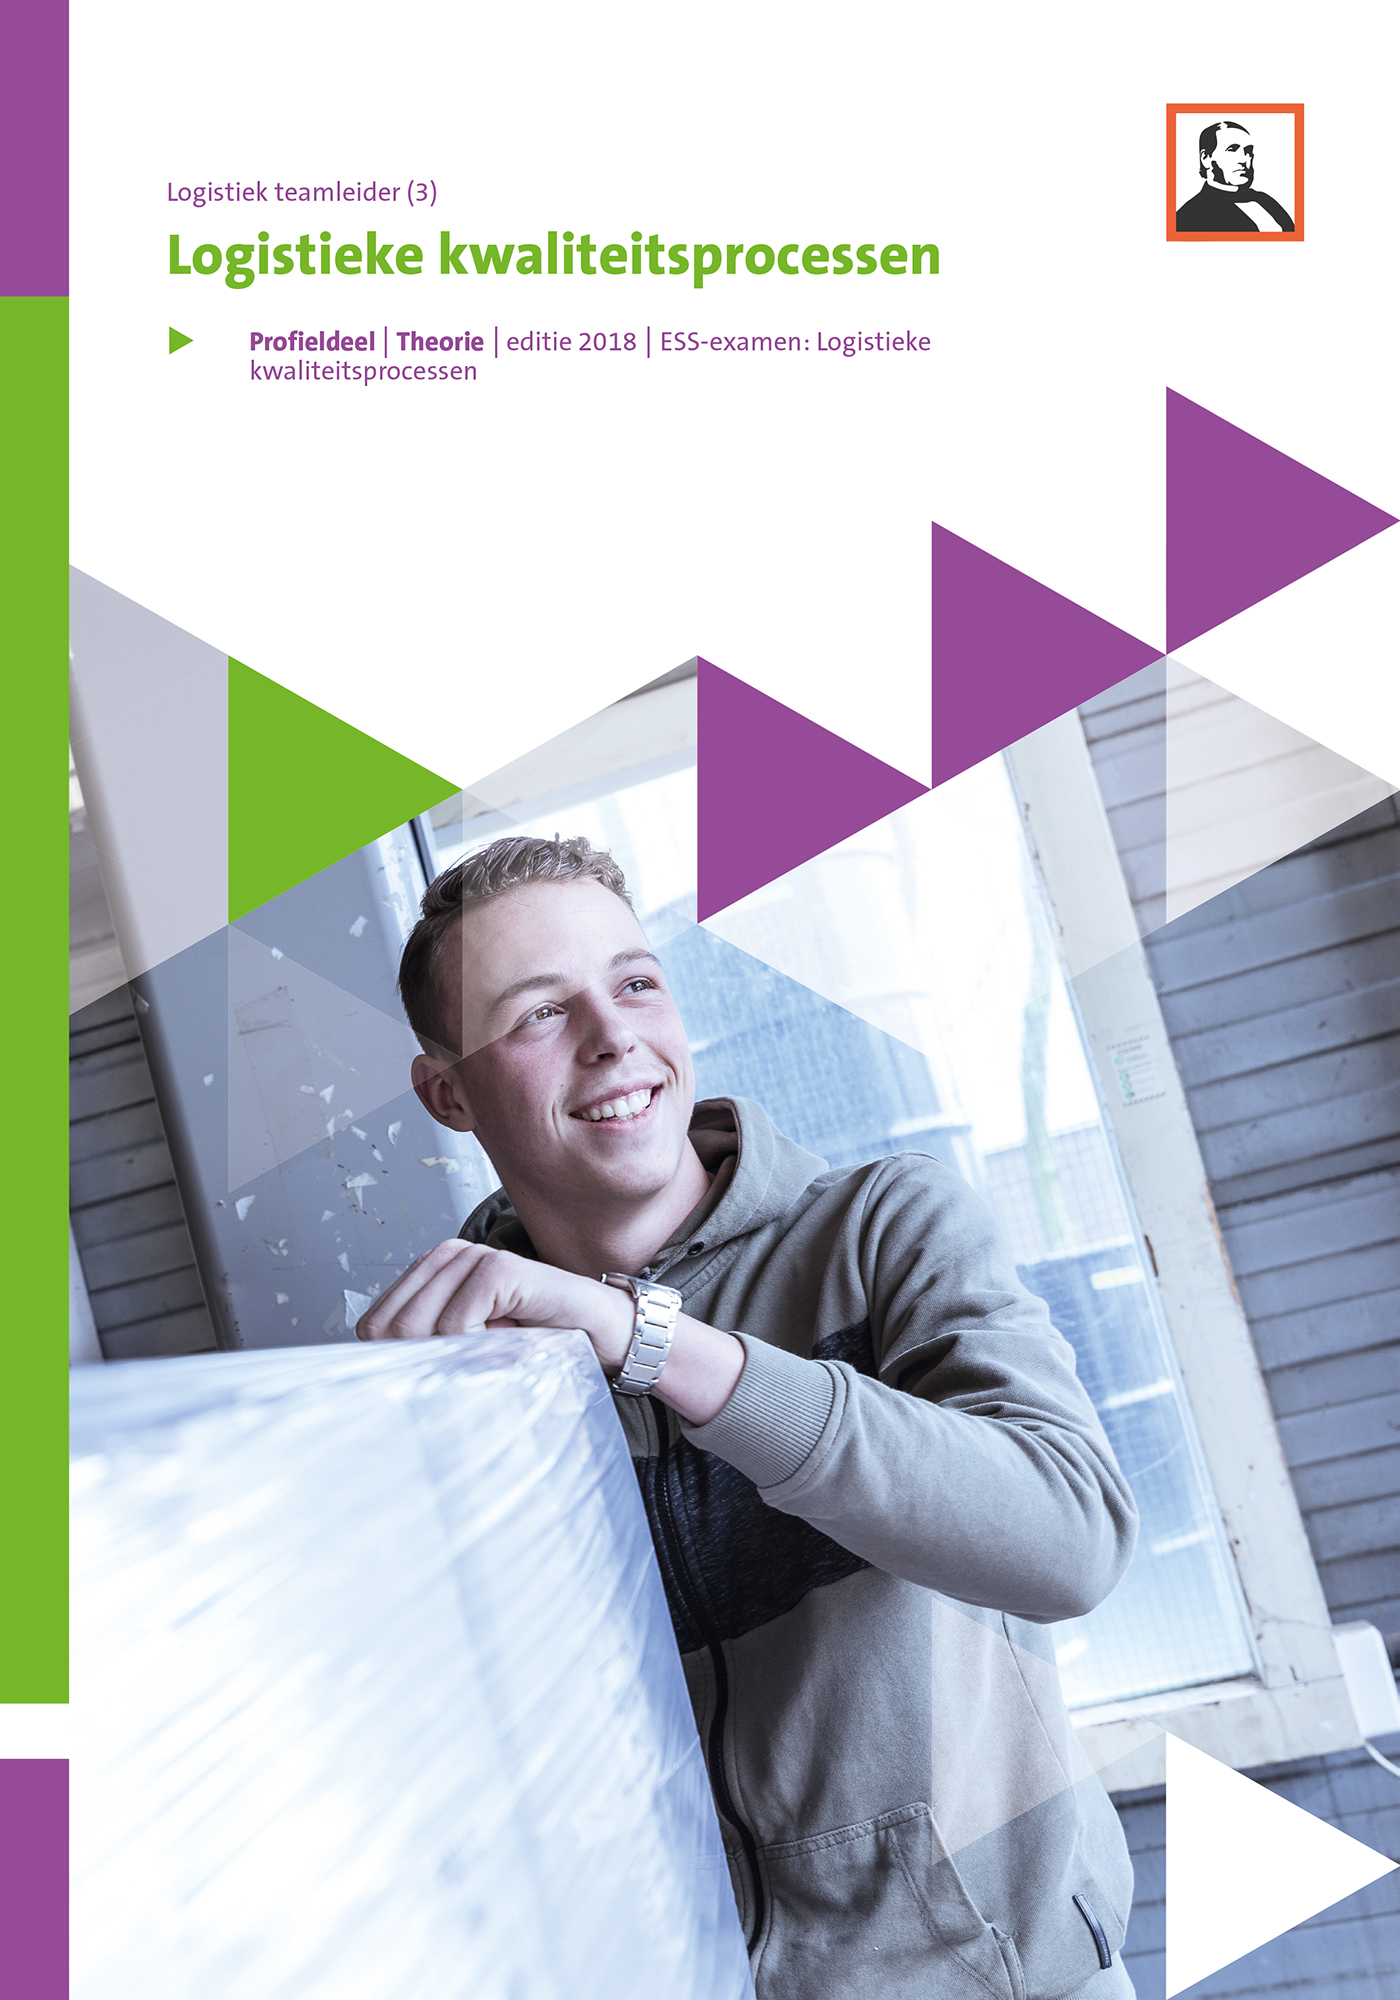 Afbeelding van Logistieke kwaliteitsprocessen (niveau 3) (A4)